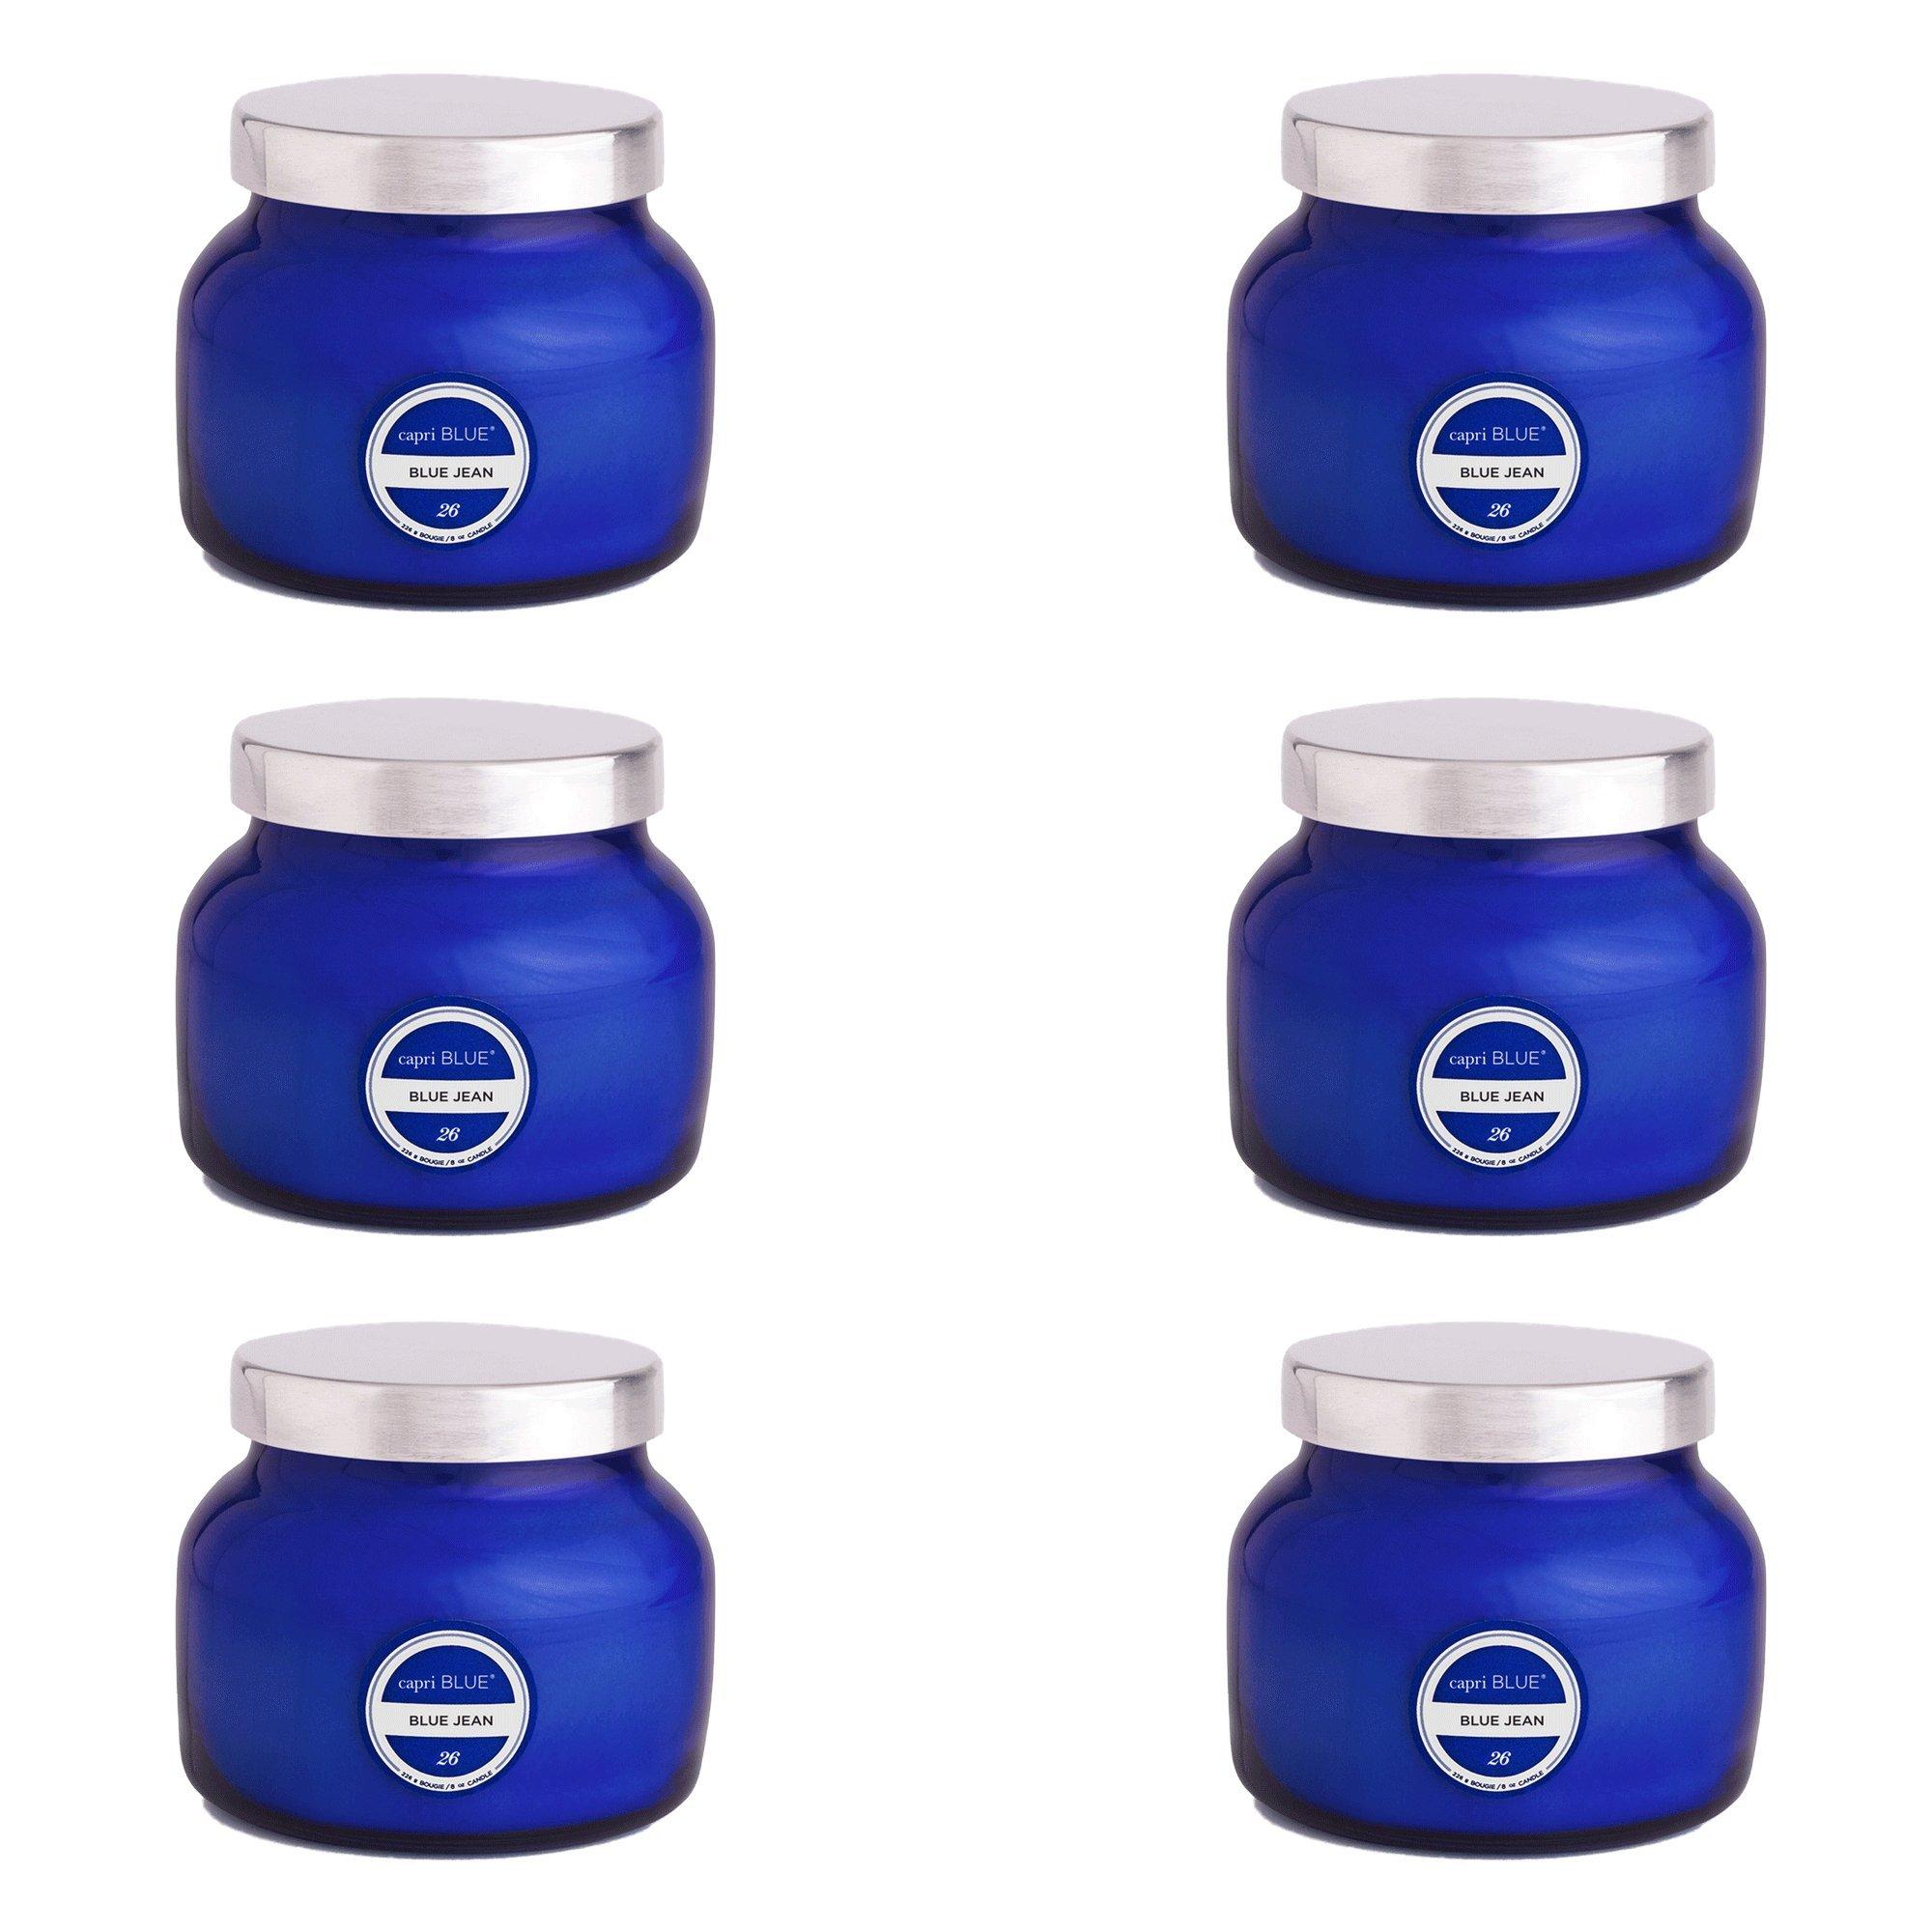 Capri Blue 8 oz Signature Petite Blue Jar Blue Jean (6 pack), Assorted, One Size by Capri Blue